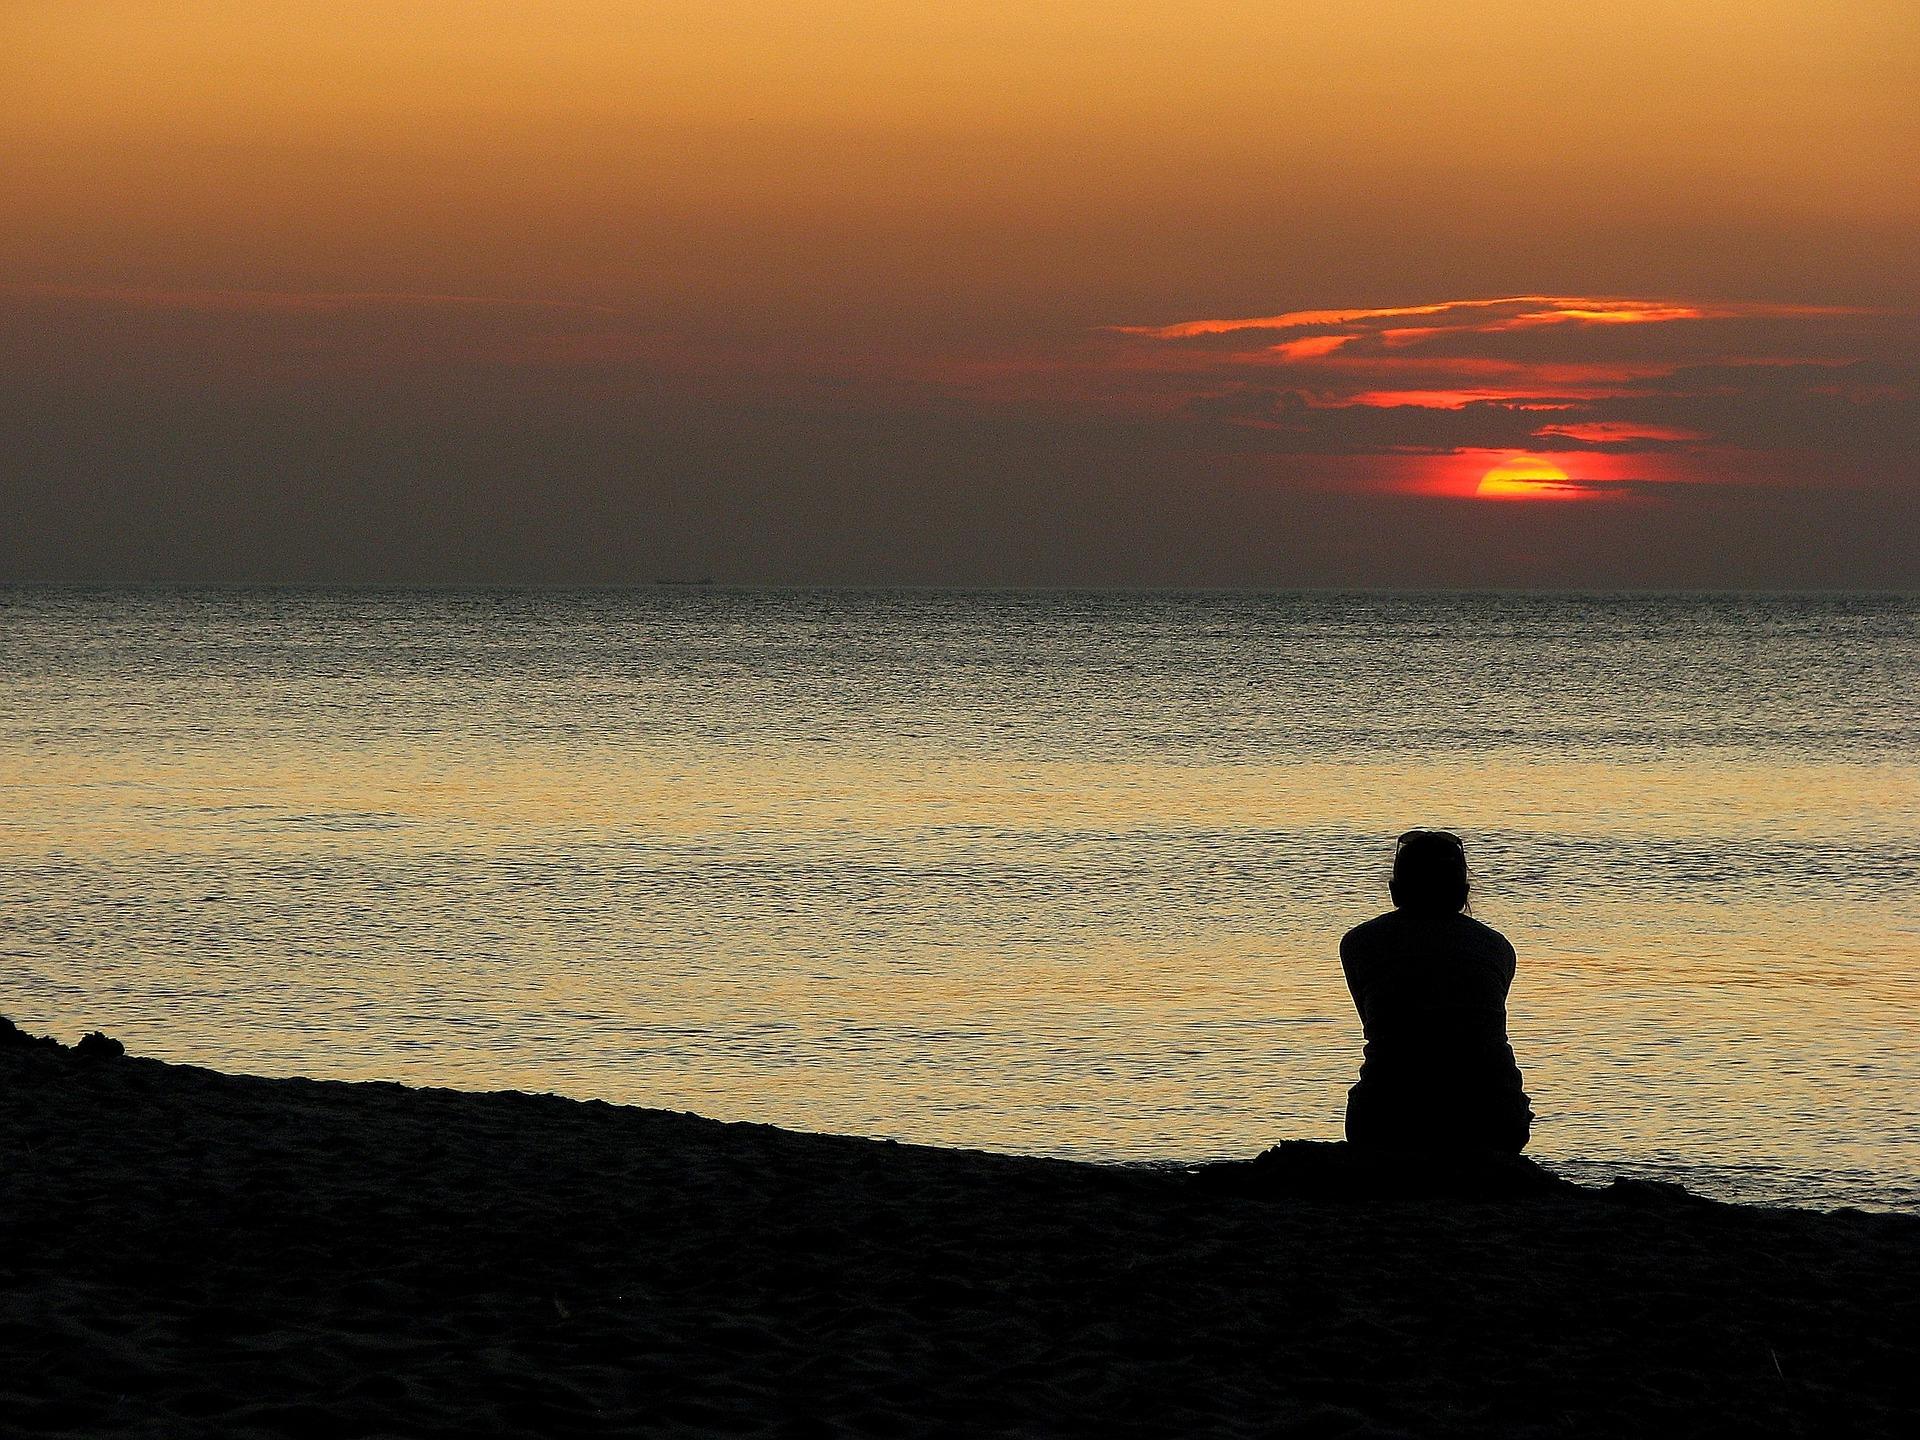 картинка одинокий мужчина на берегу моря